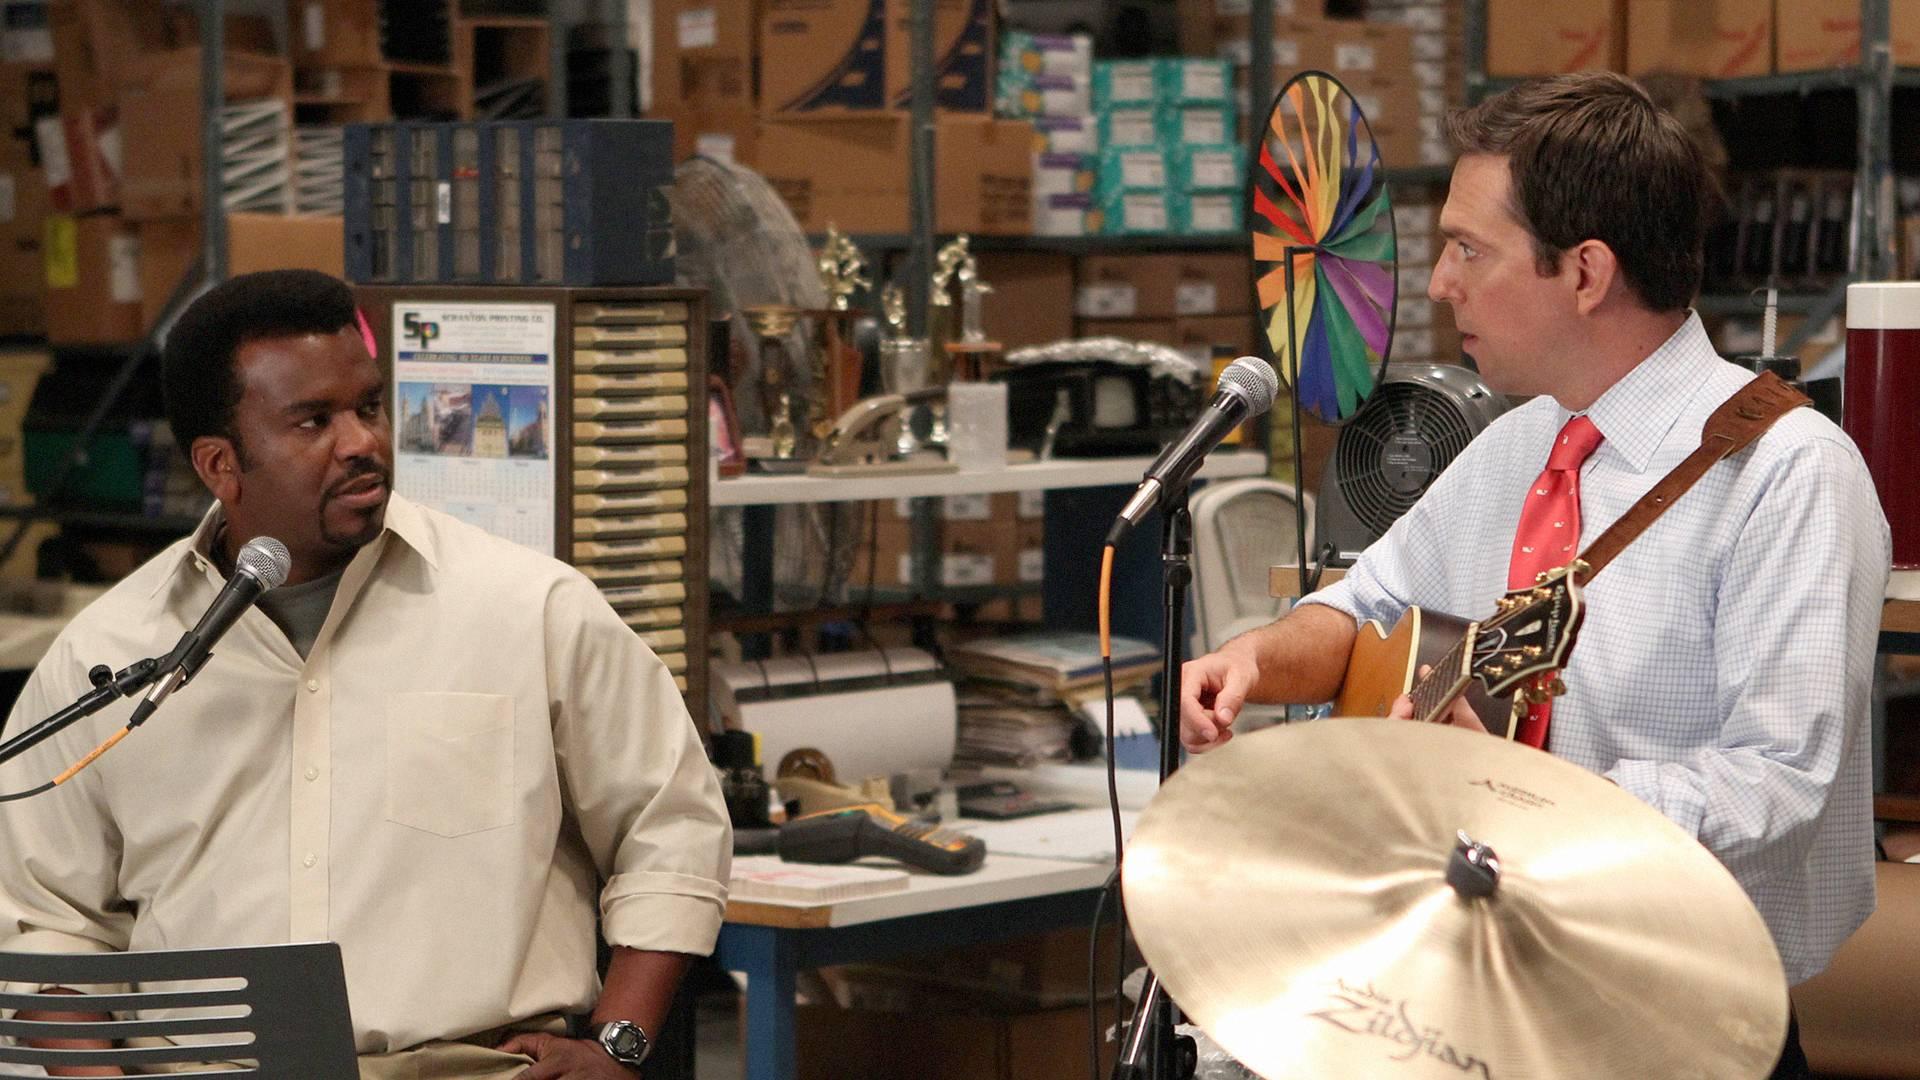 The Office Season 7 Episode 5